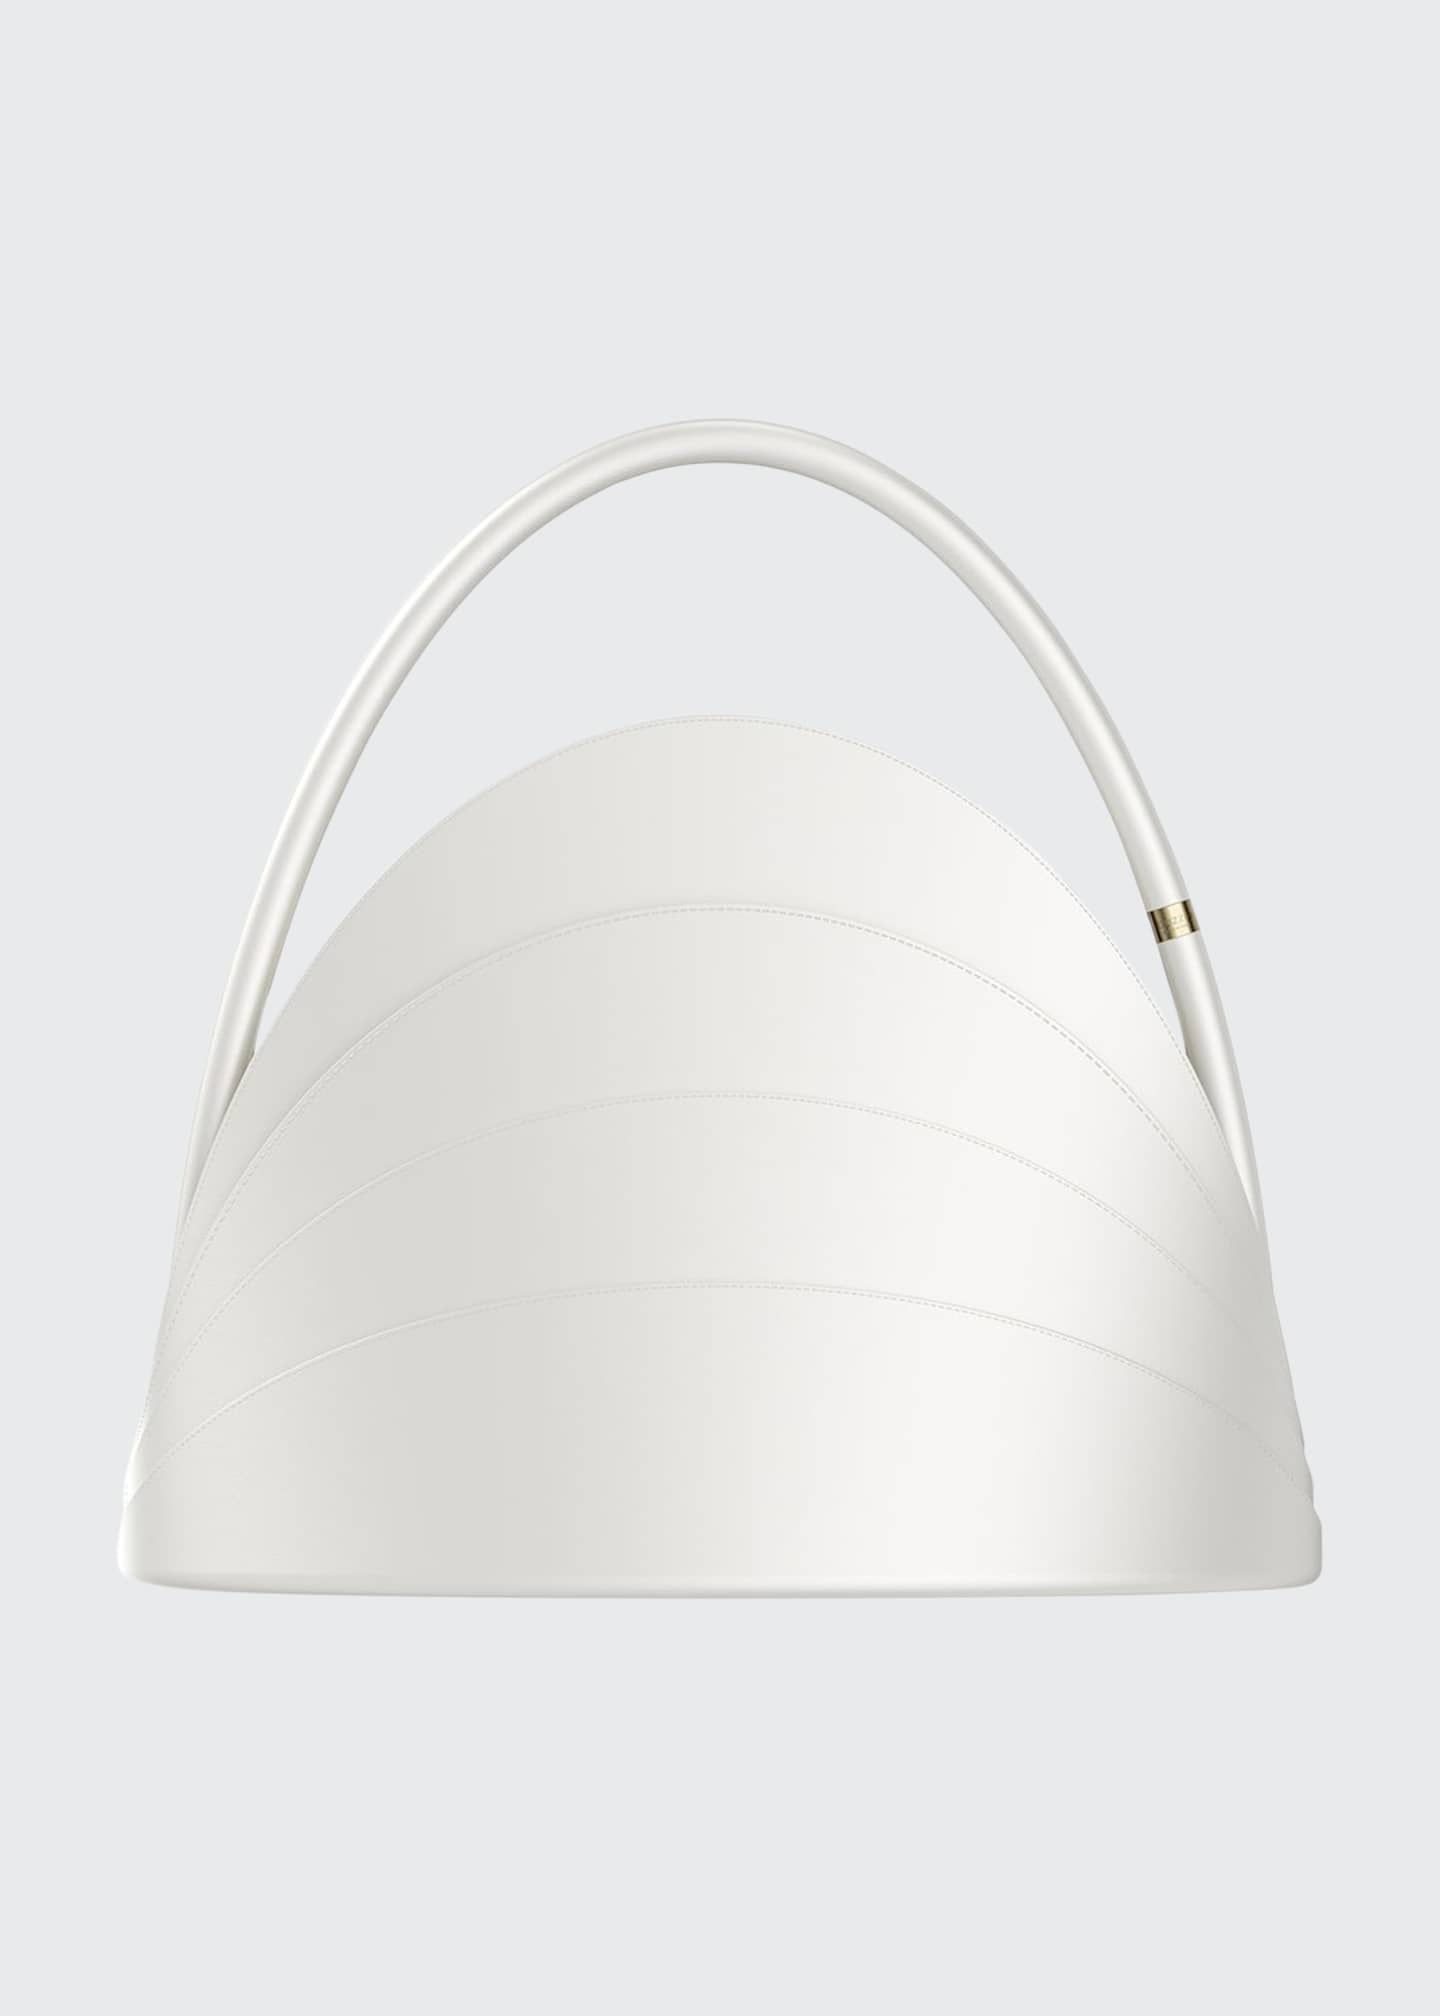 Gabo Guzzo Millefoglie Layered Top-Handle Bag, White